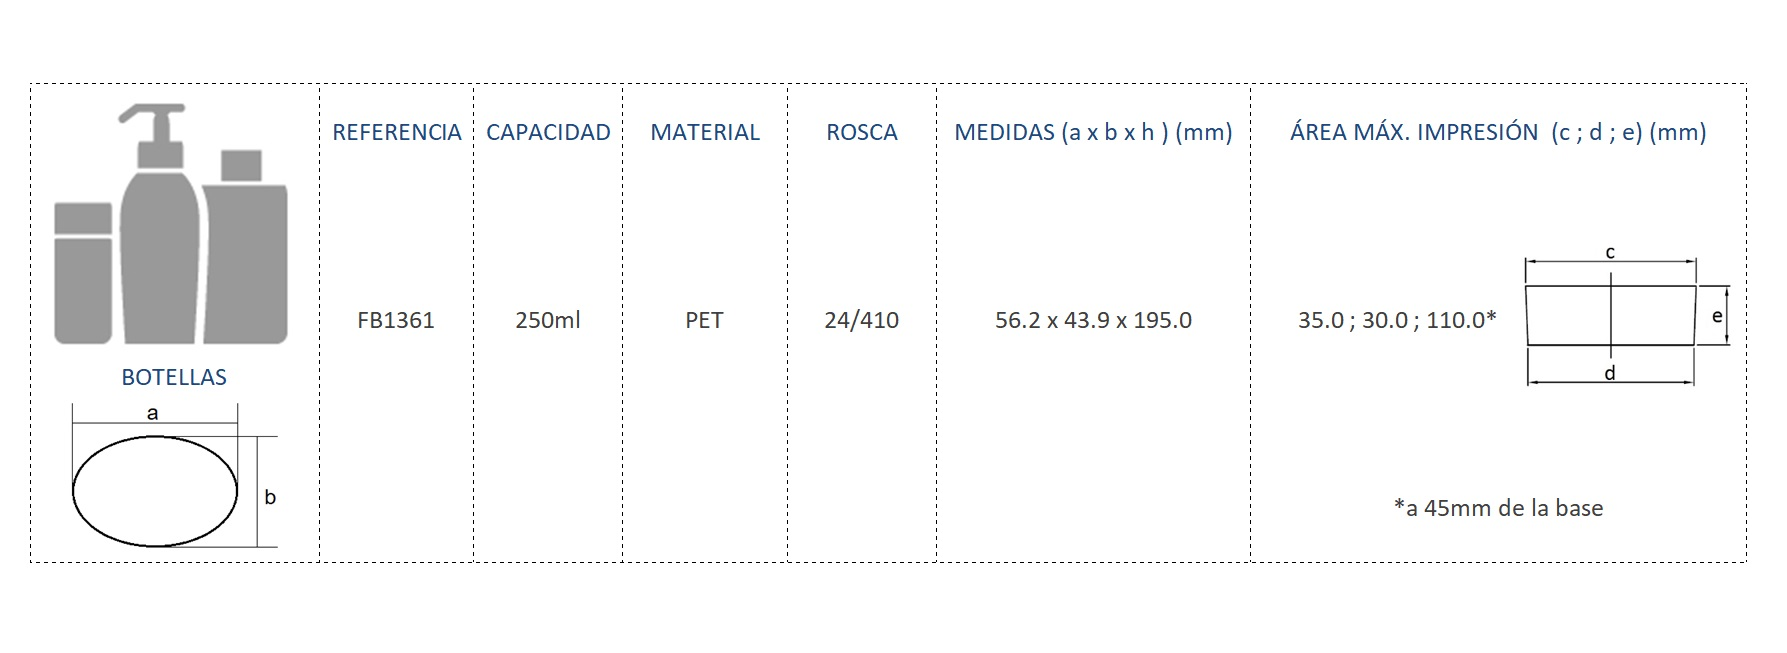 Cuadro de materiales botella FB1361